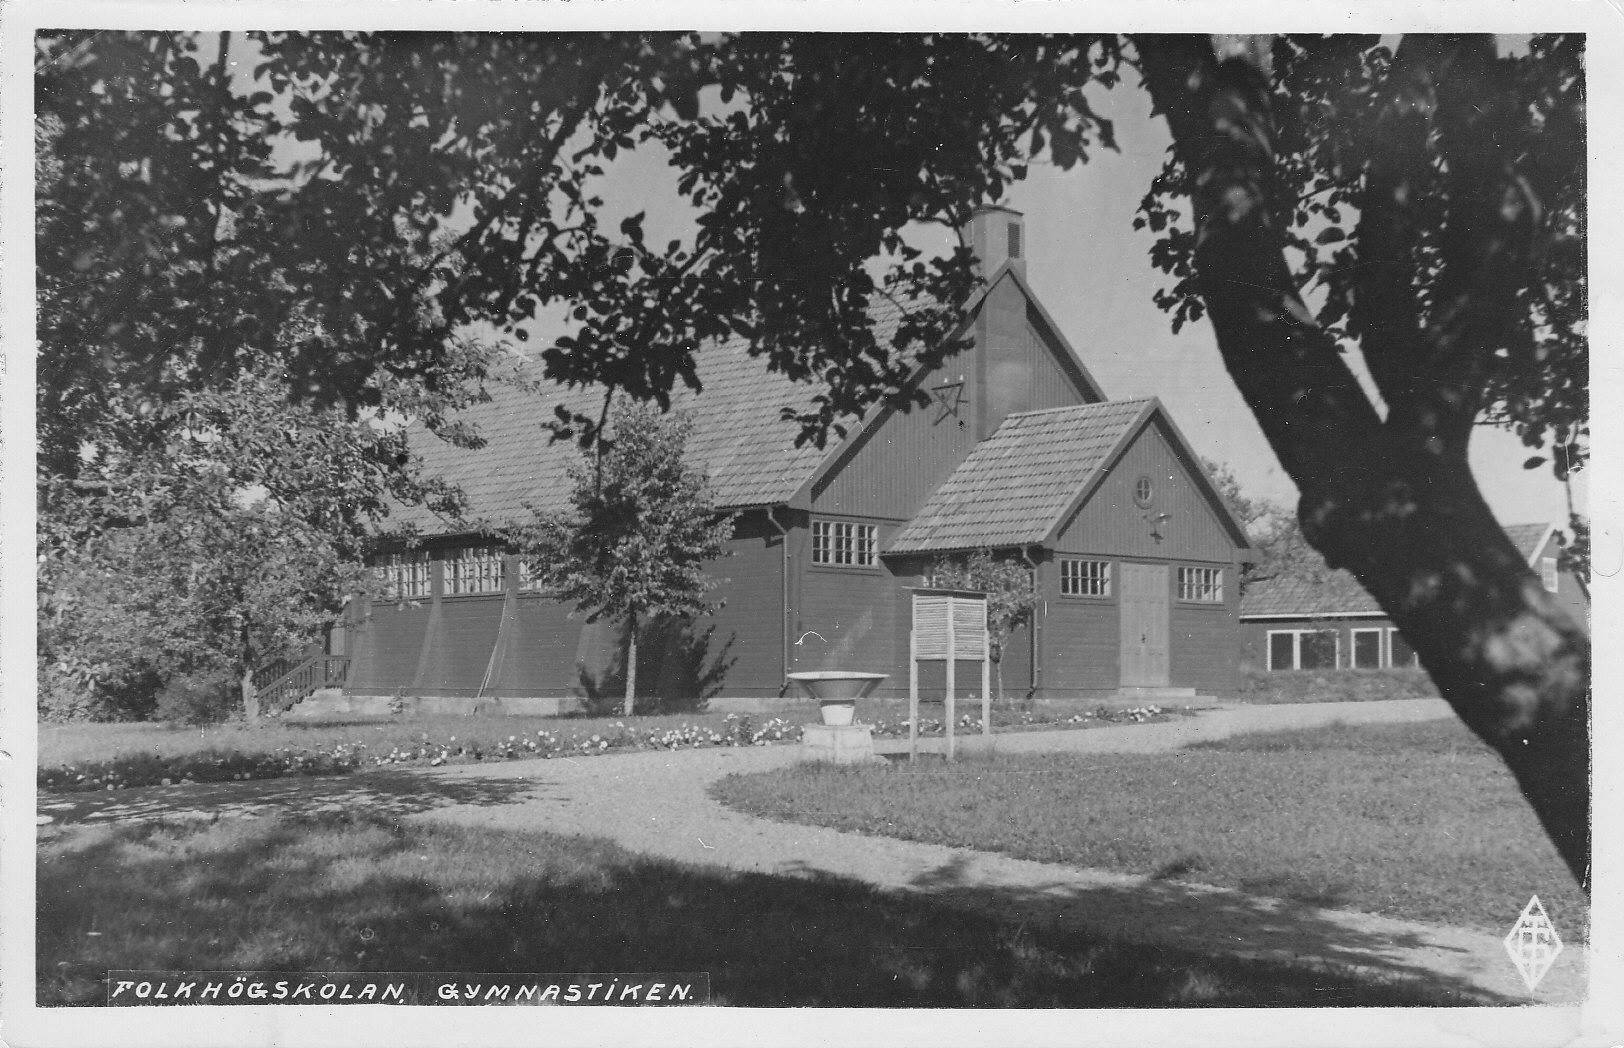 Folkhögskolans gymnastikhall. Byggdes på 1910-talet.